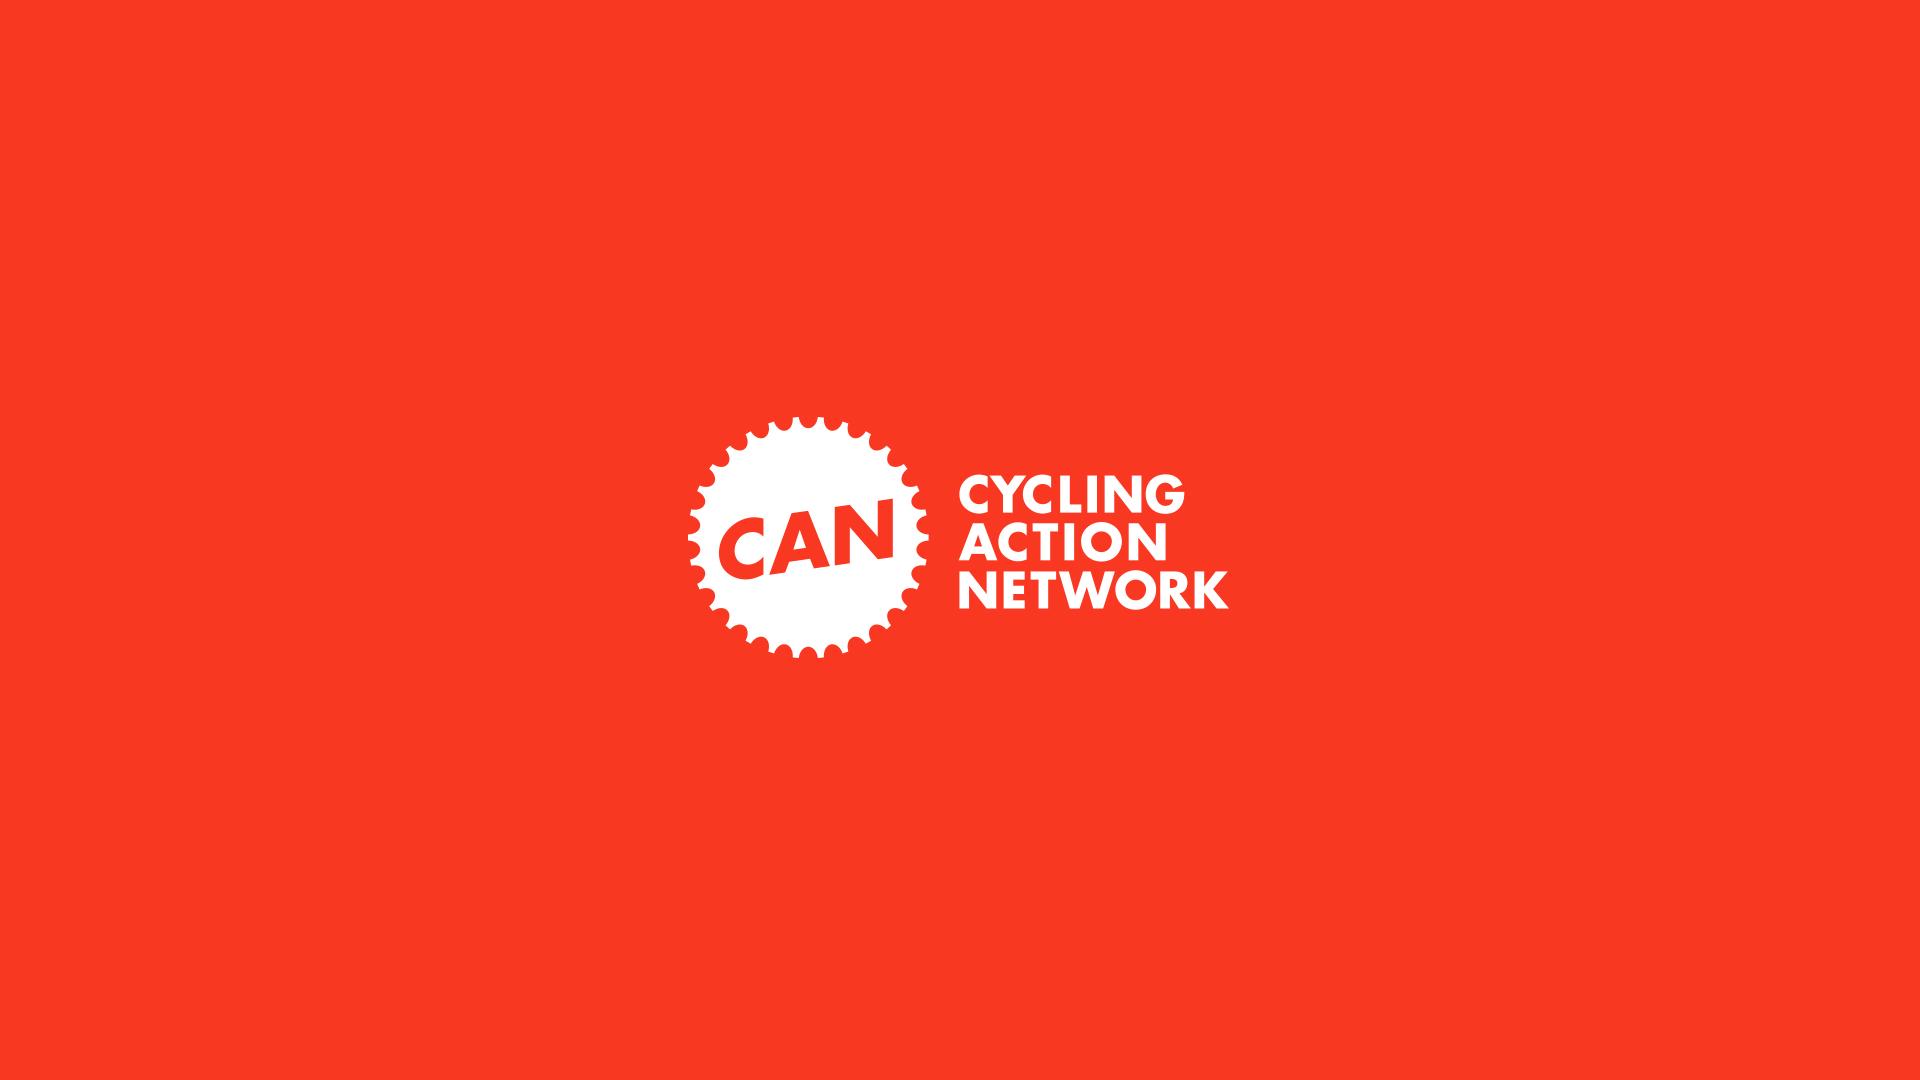 CAN Brand Identity Logo Design